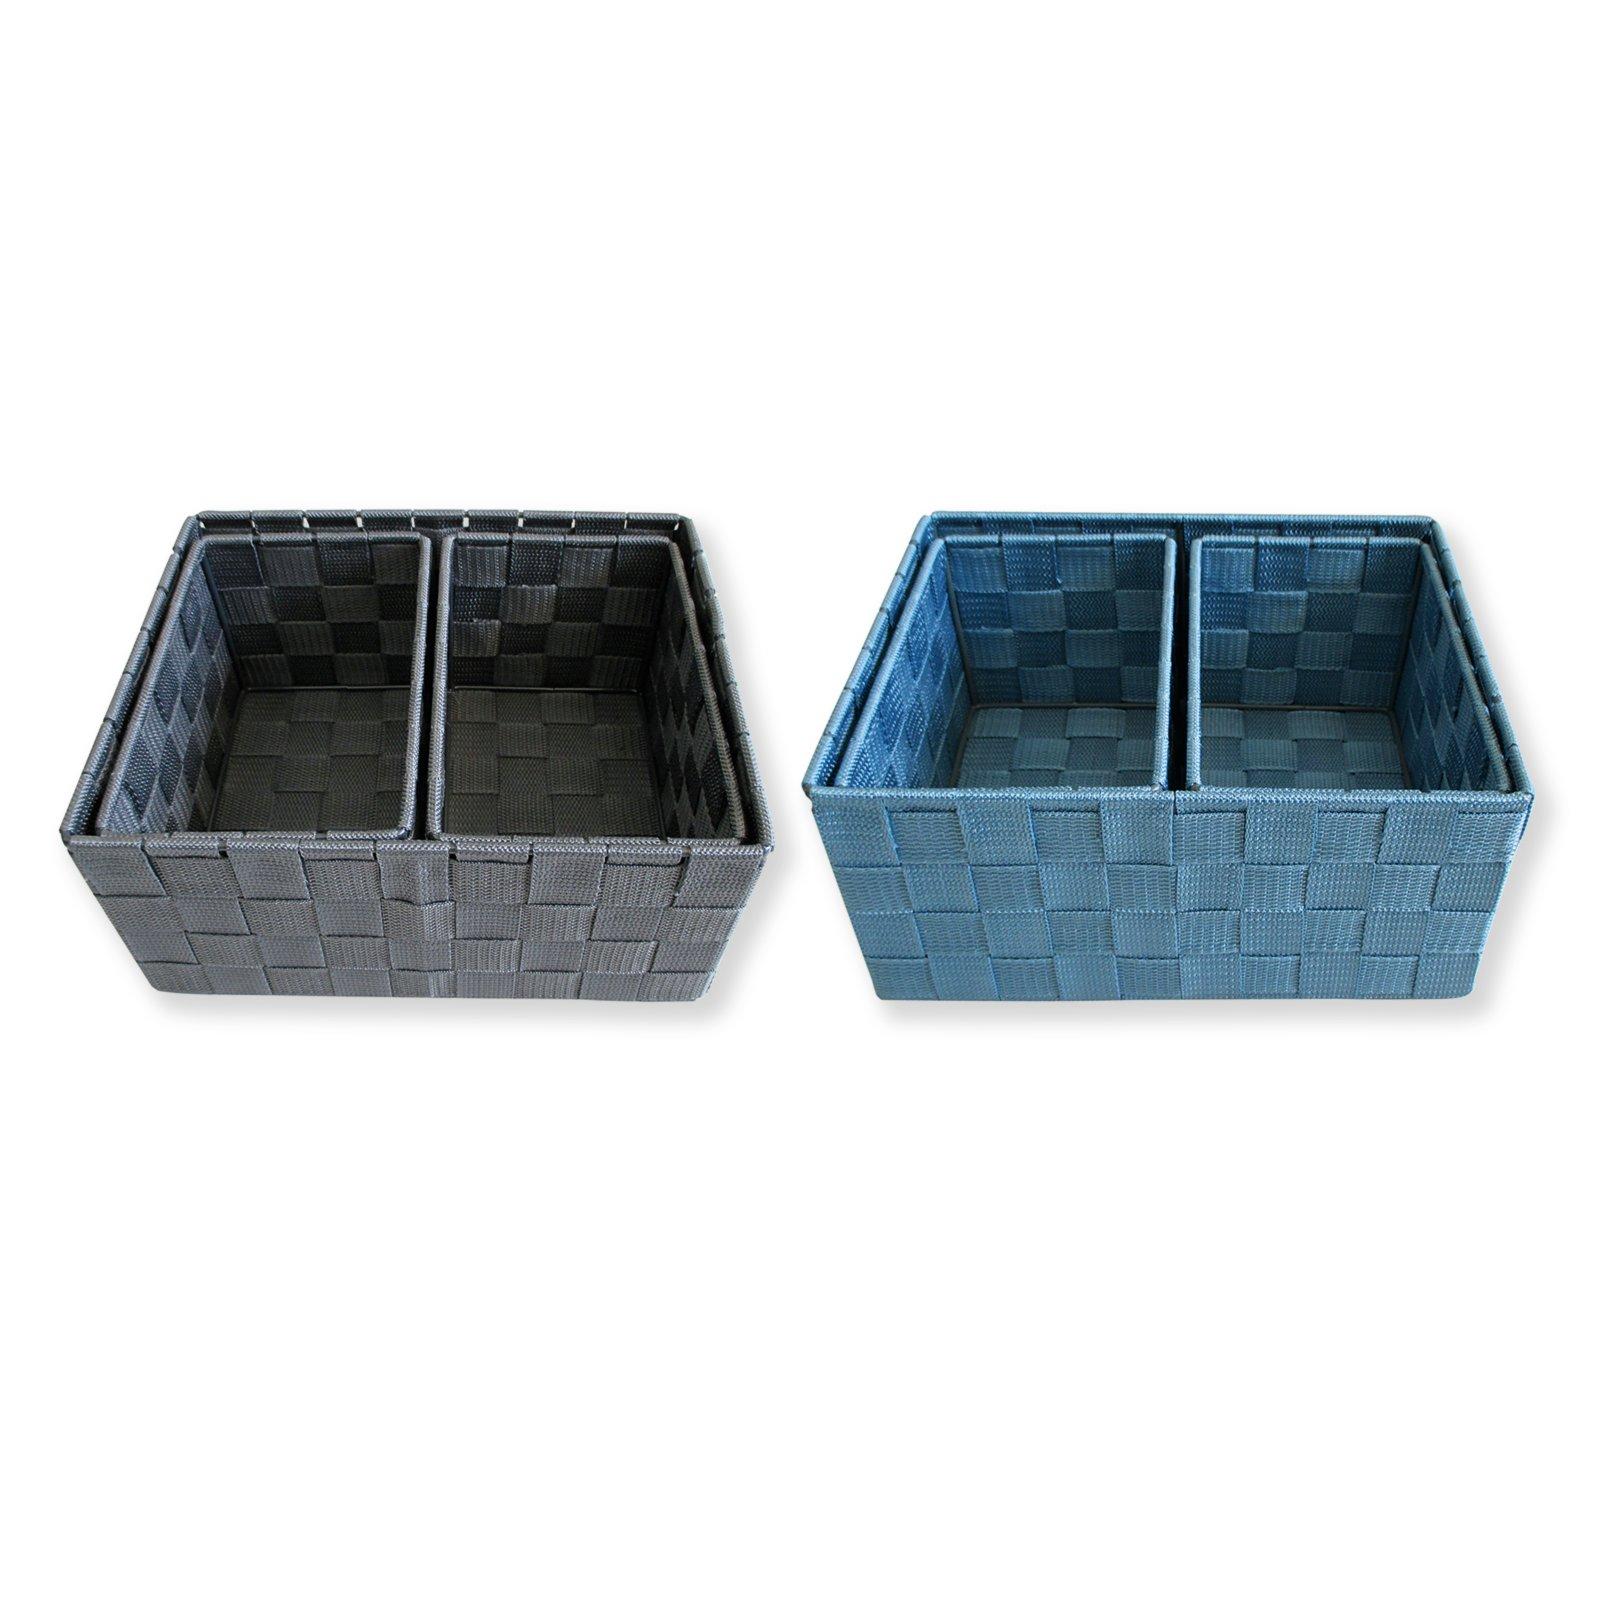 aufbewahrungsk rbe keine farbauswahl 3 teilig dekorative boxen k rbe boxen k rbe. Black Bedroom Furniture Sets. Home Design Ideas